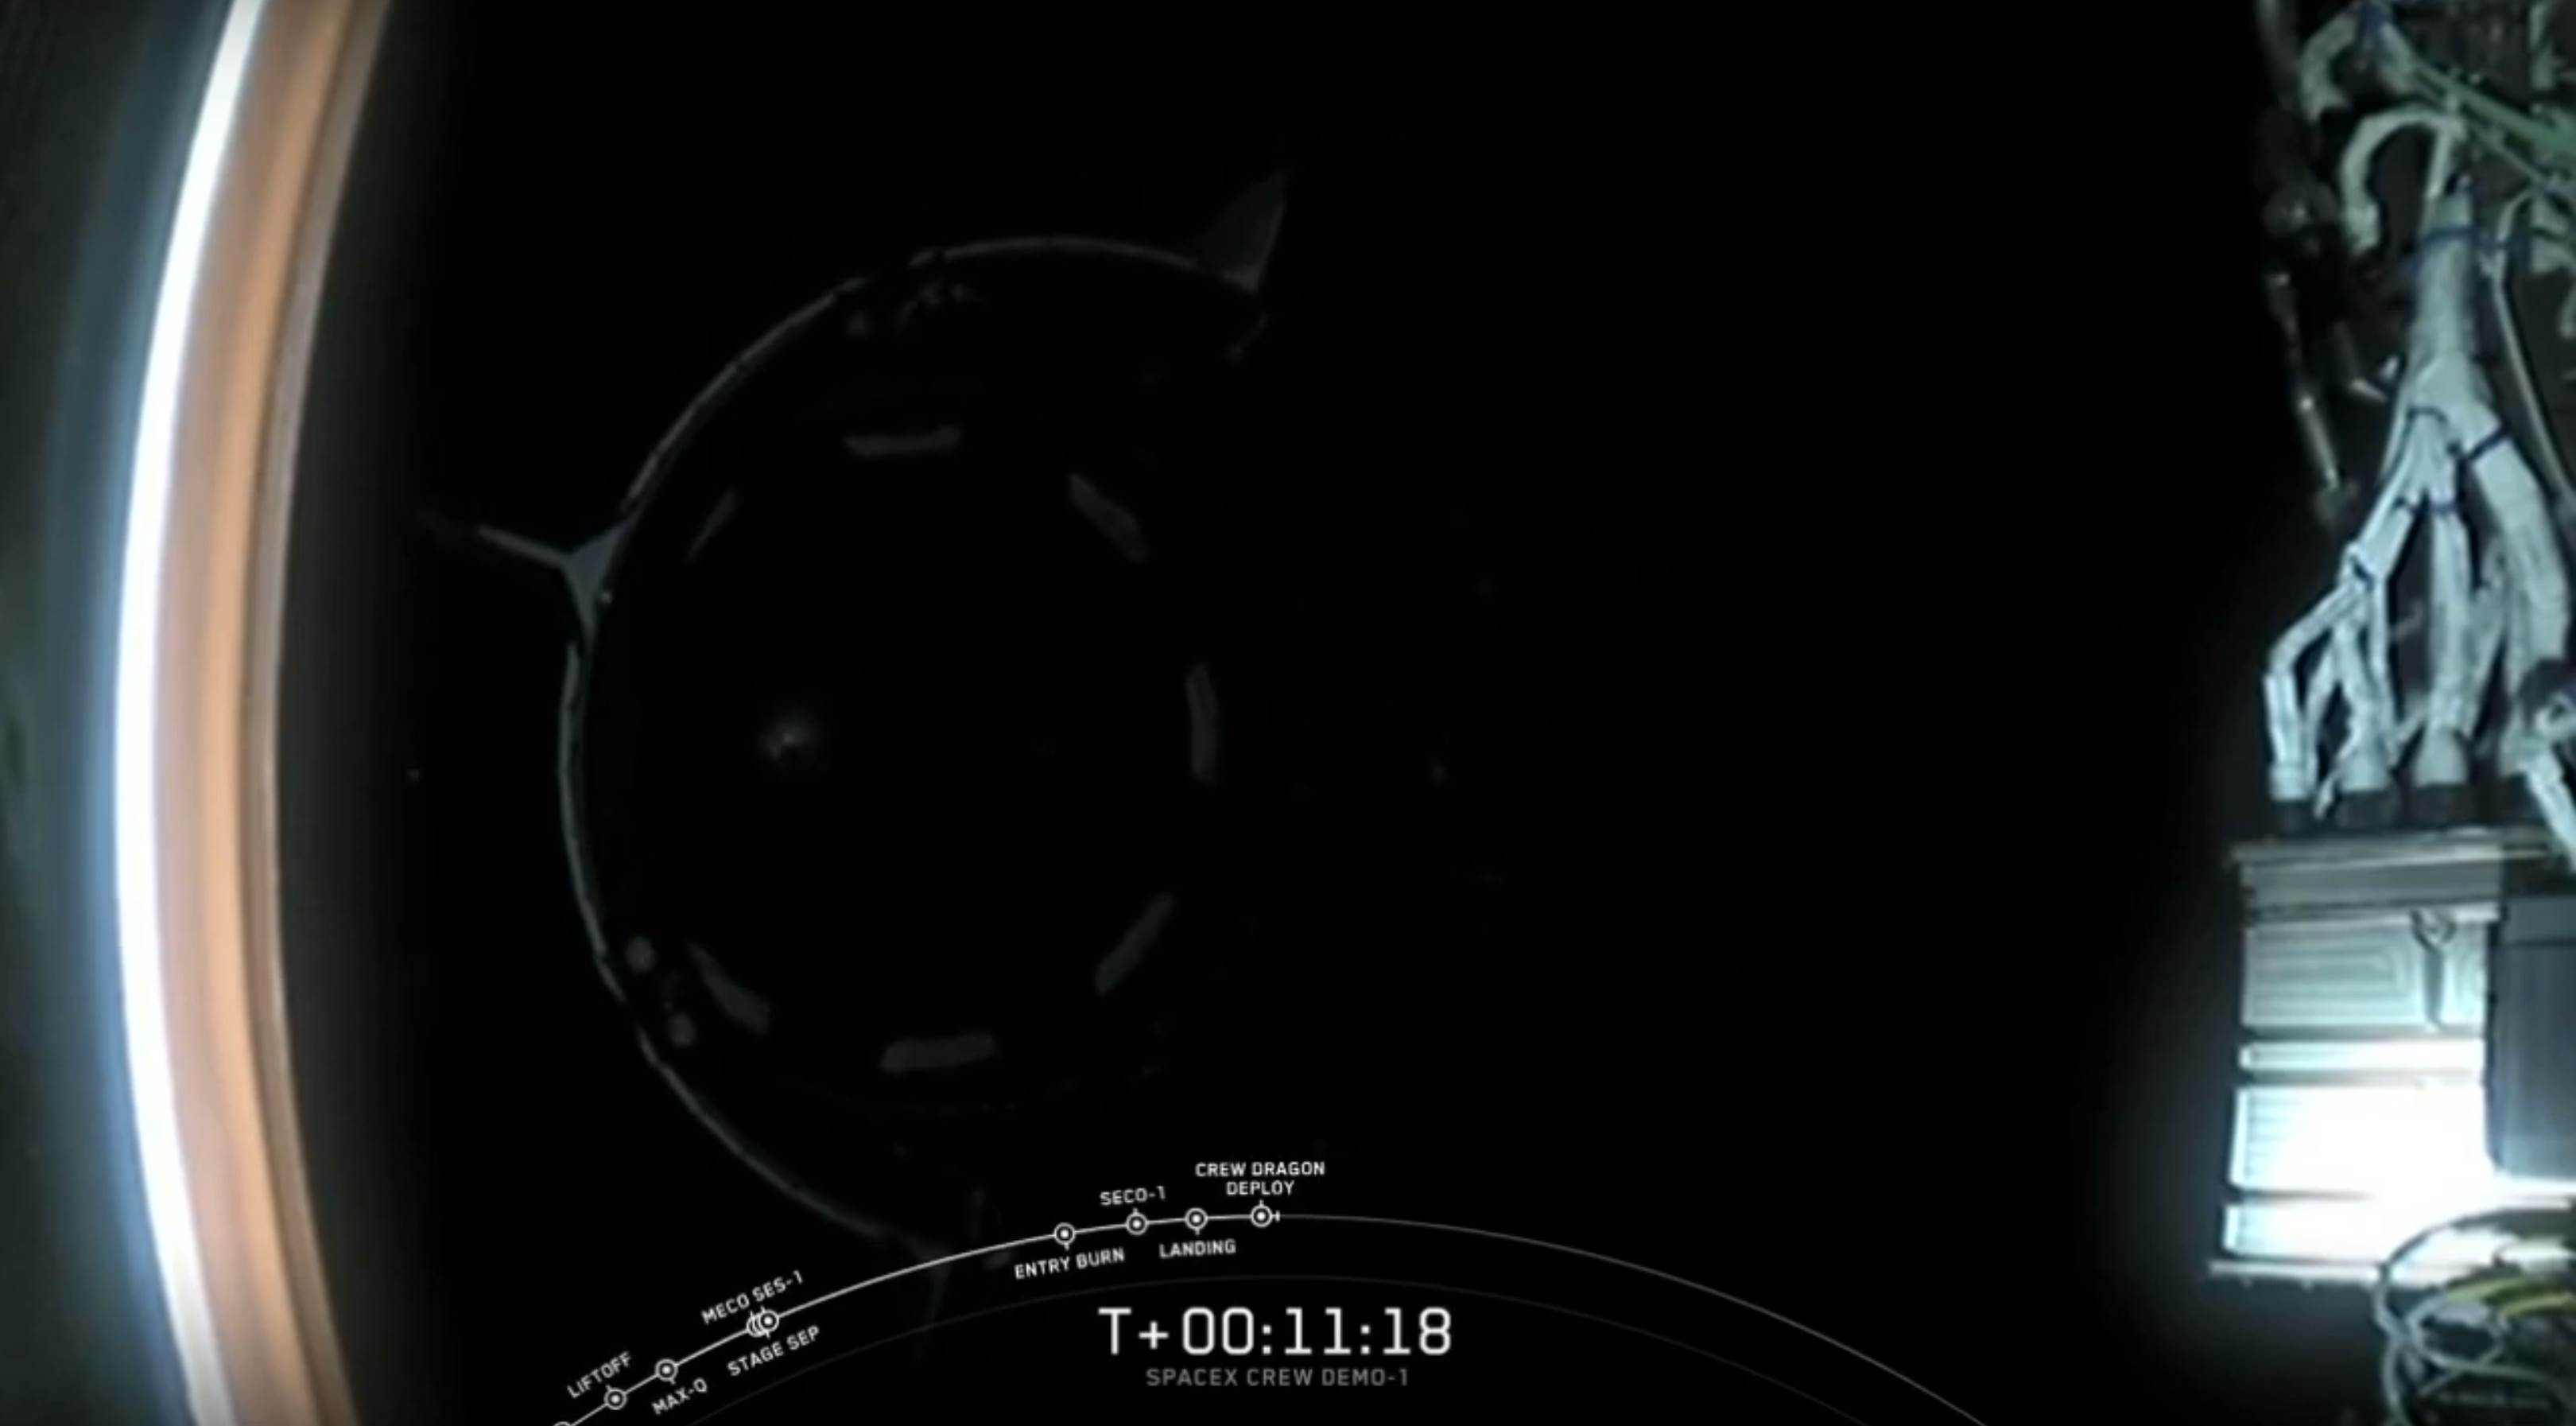 DM-1 Crew Dragon Falcon 9 B1051 launch (SpaceX) webcast 7